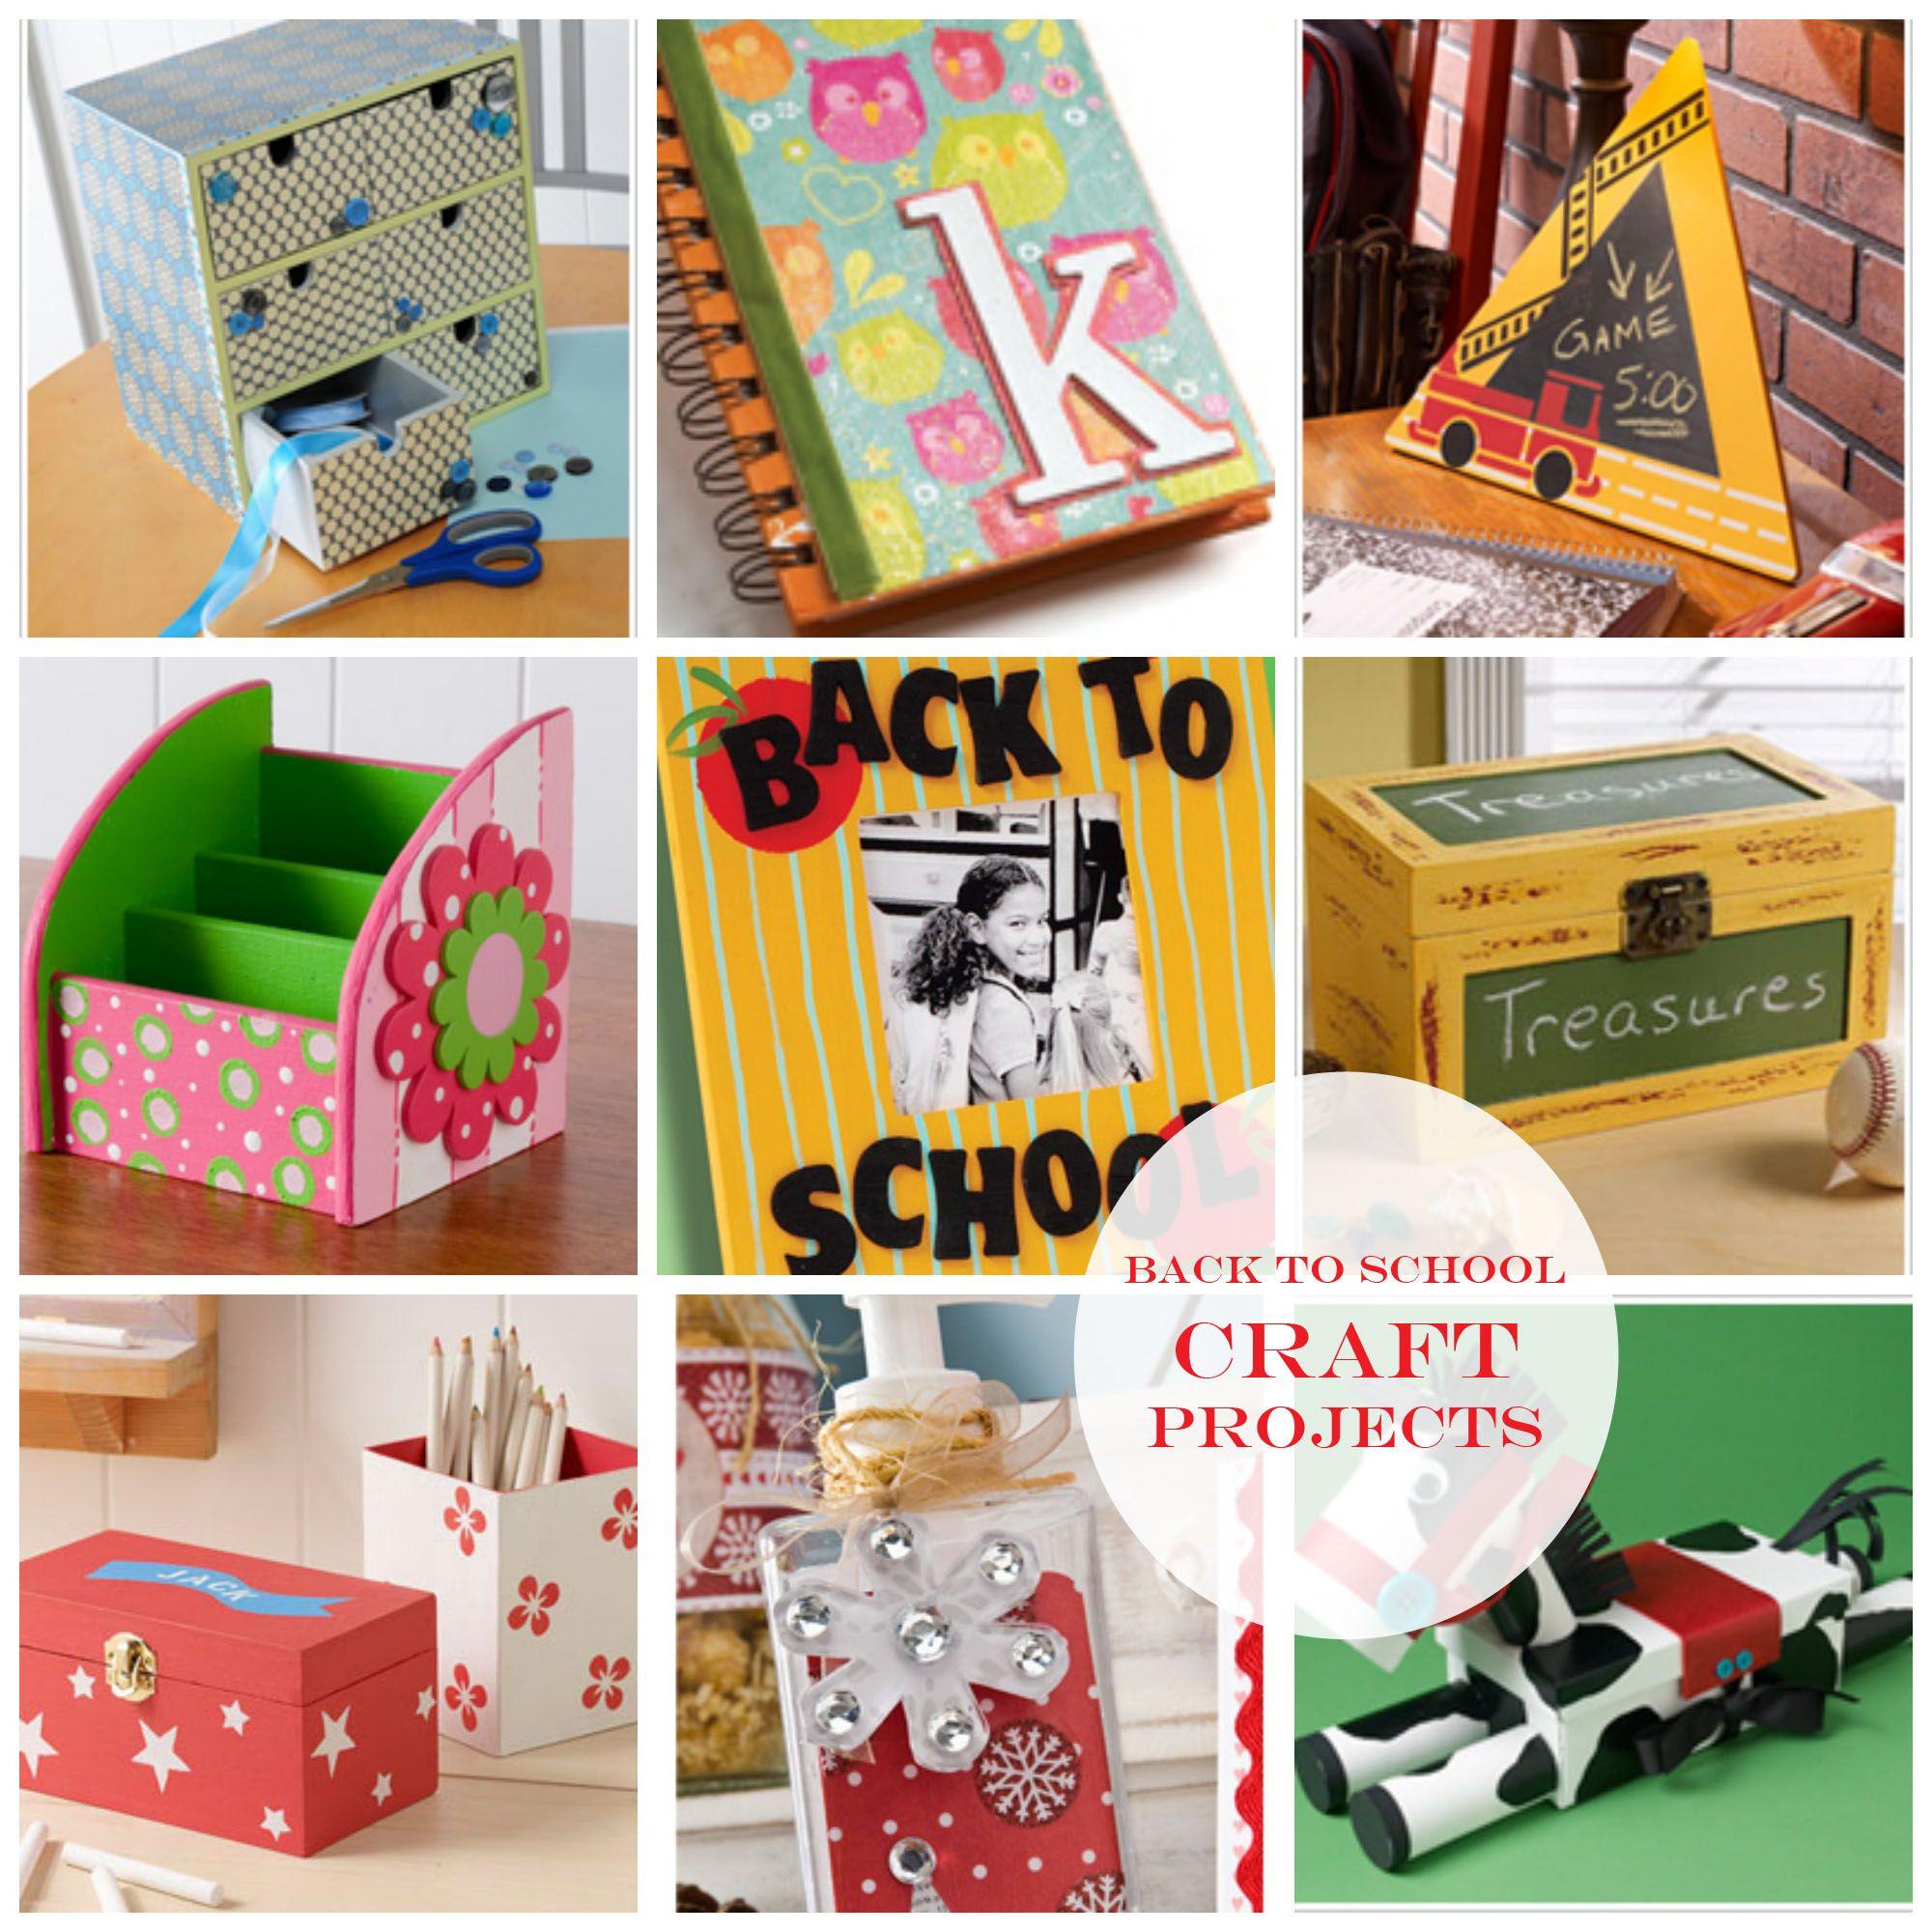 Back to school craft project ideas diy crafts for School diy ideas